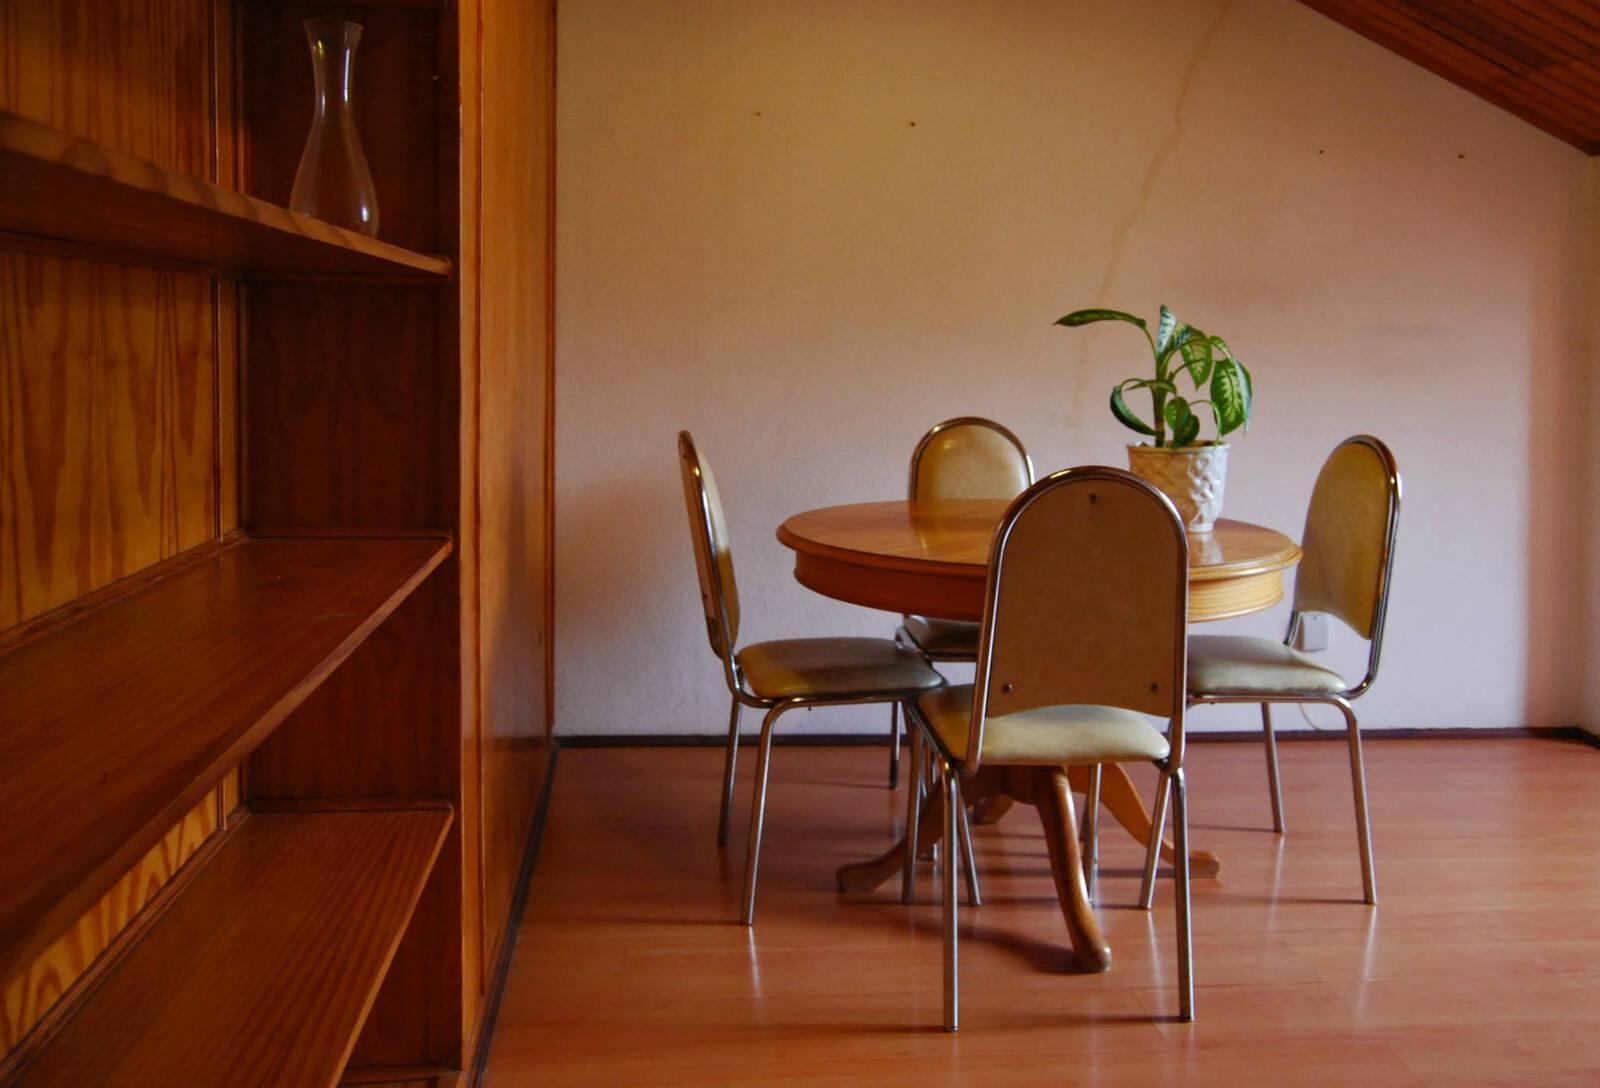 pf17427-apartamento-t1-lisboa-c1a1dfc7-64b1-469f-b69e-968bed0e3cfc